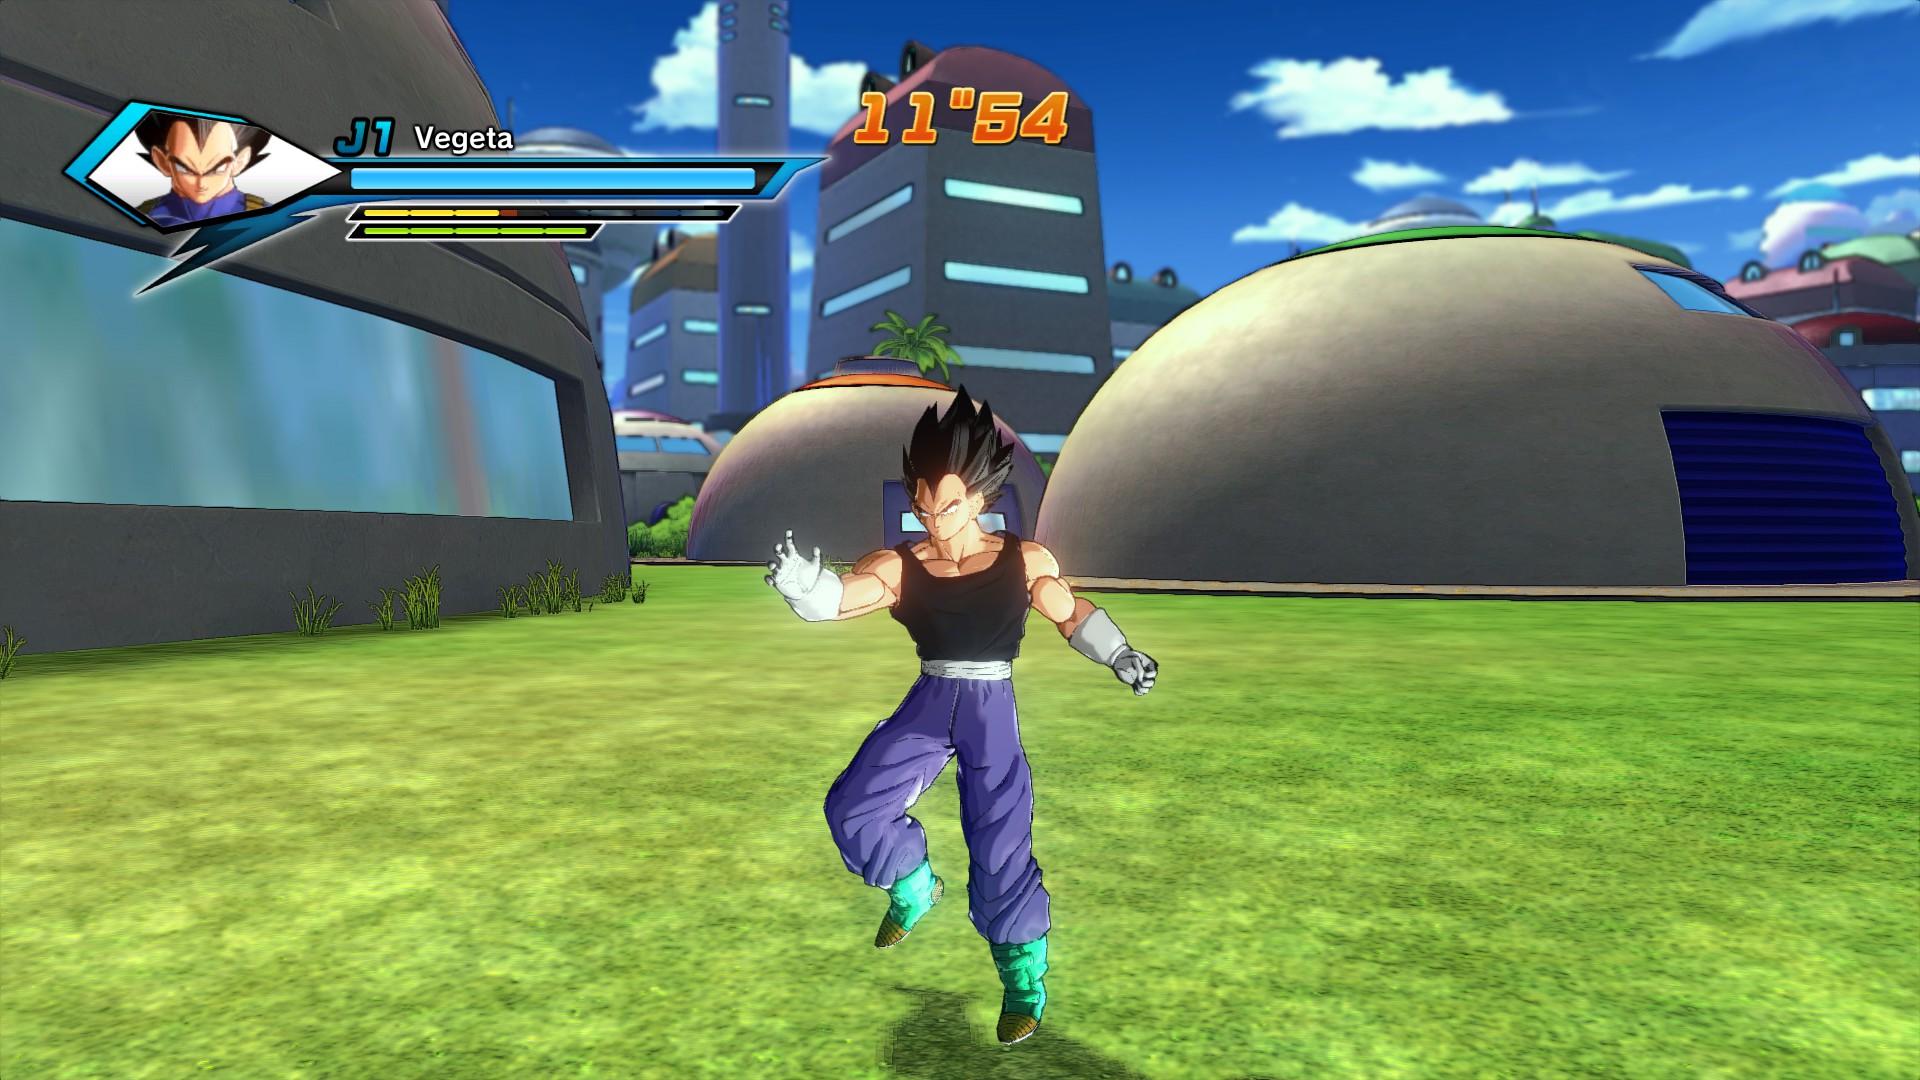 West532   Jotaro Kujou0026#39;s Hairstyle For CaC. (W.I.P)   Dragon Ball Xenoverse Mods